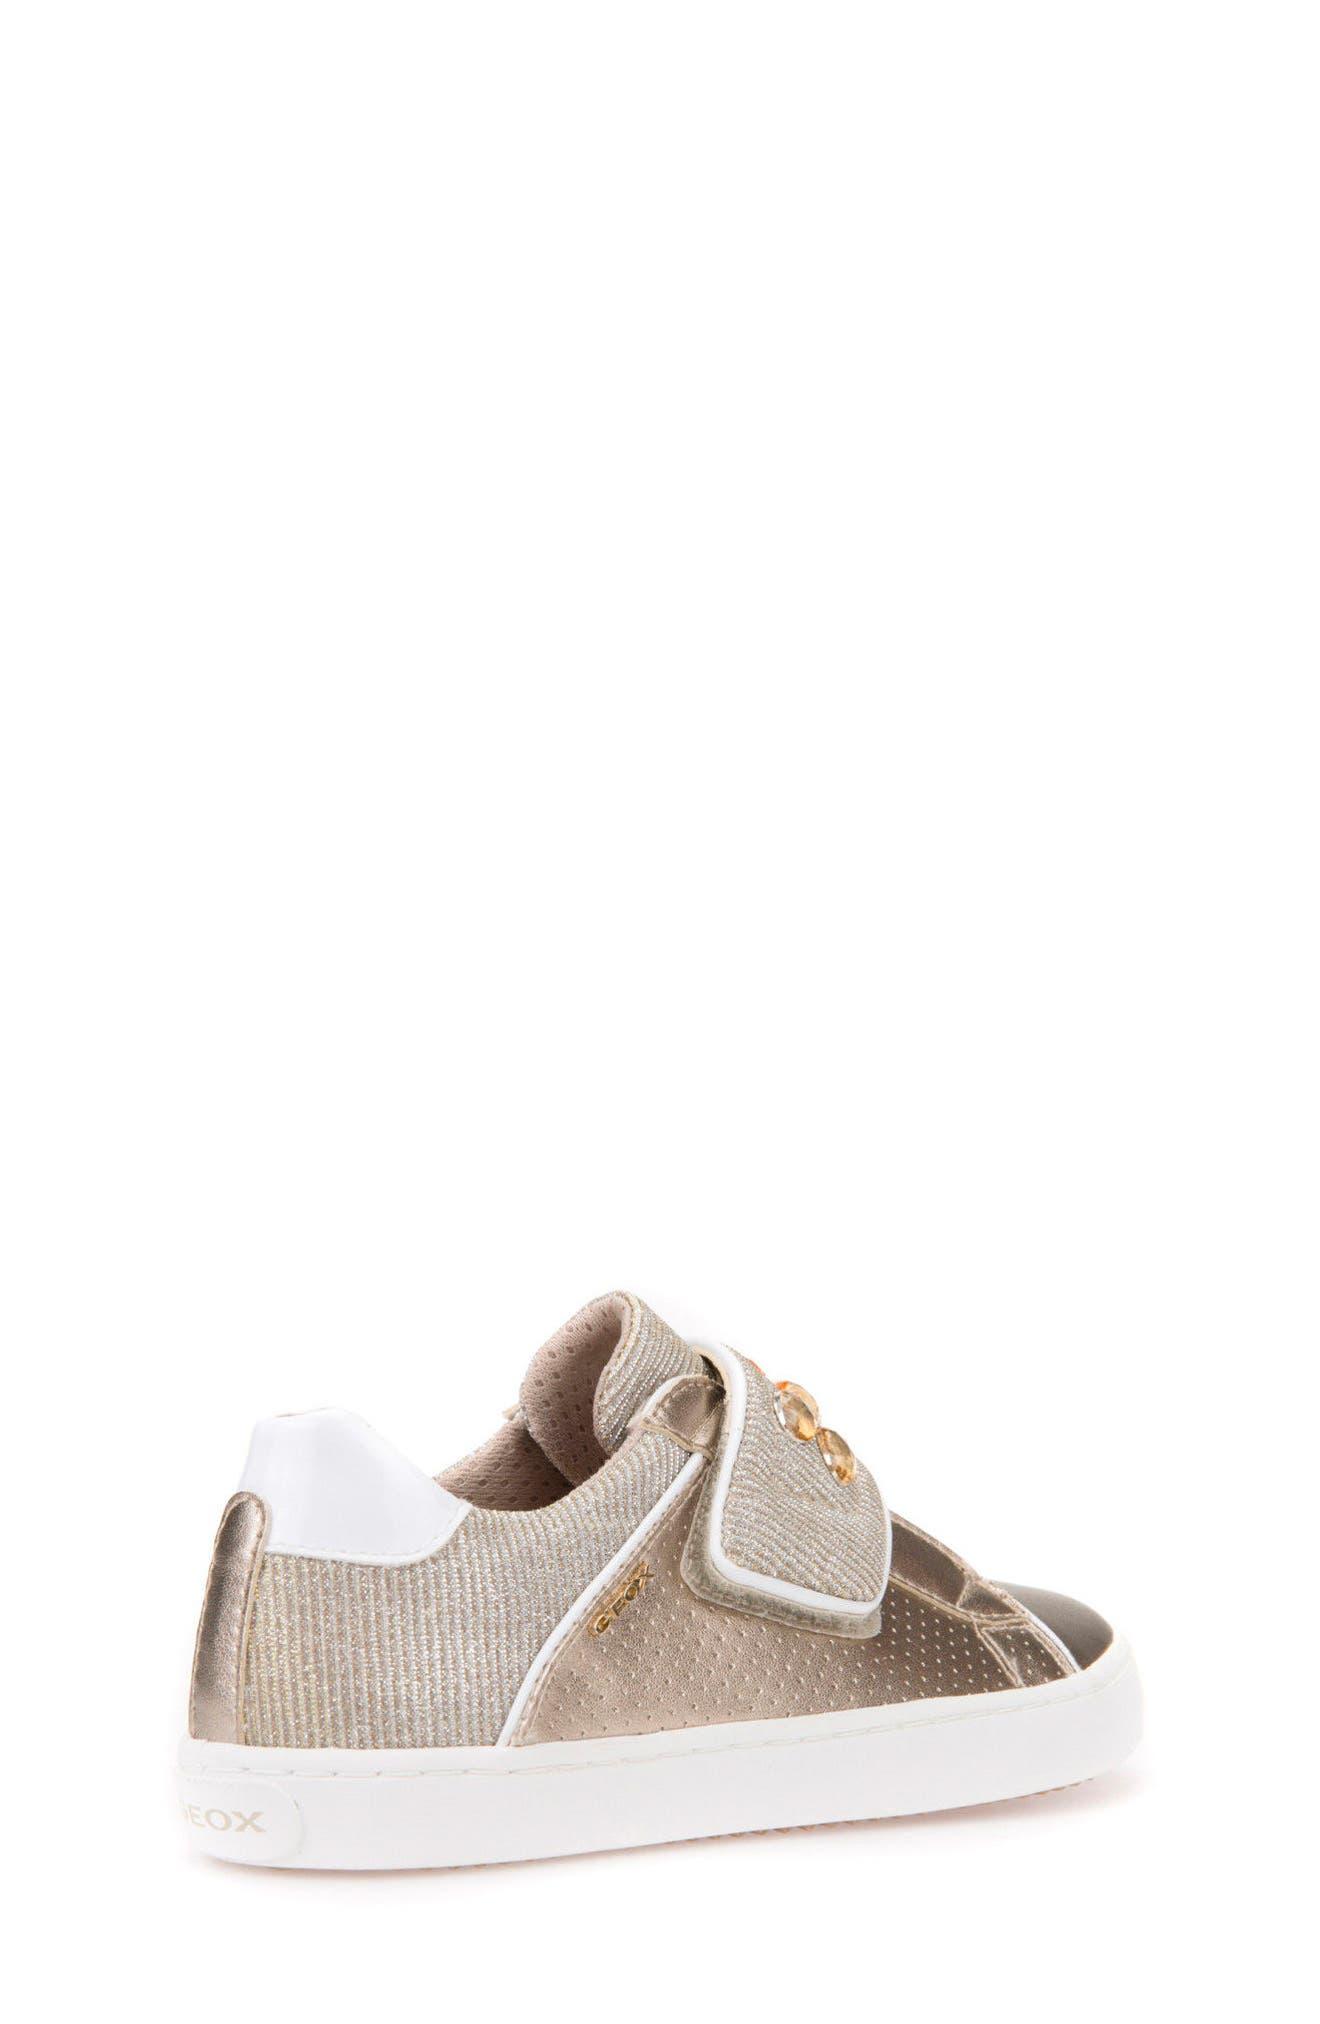 Kilwi Metallic Embellished Sneaker,                             Alternate thumbnail 2, color,                             GOLD